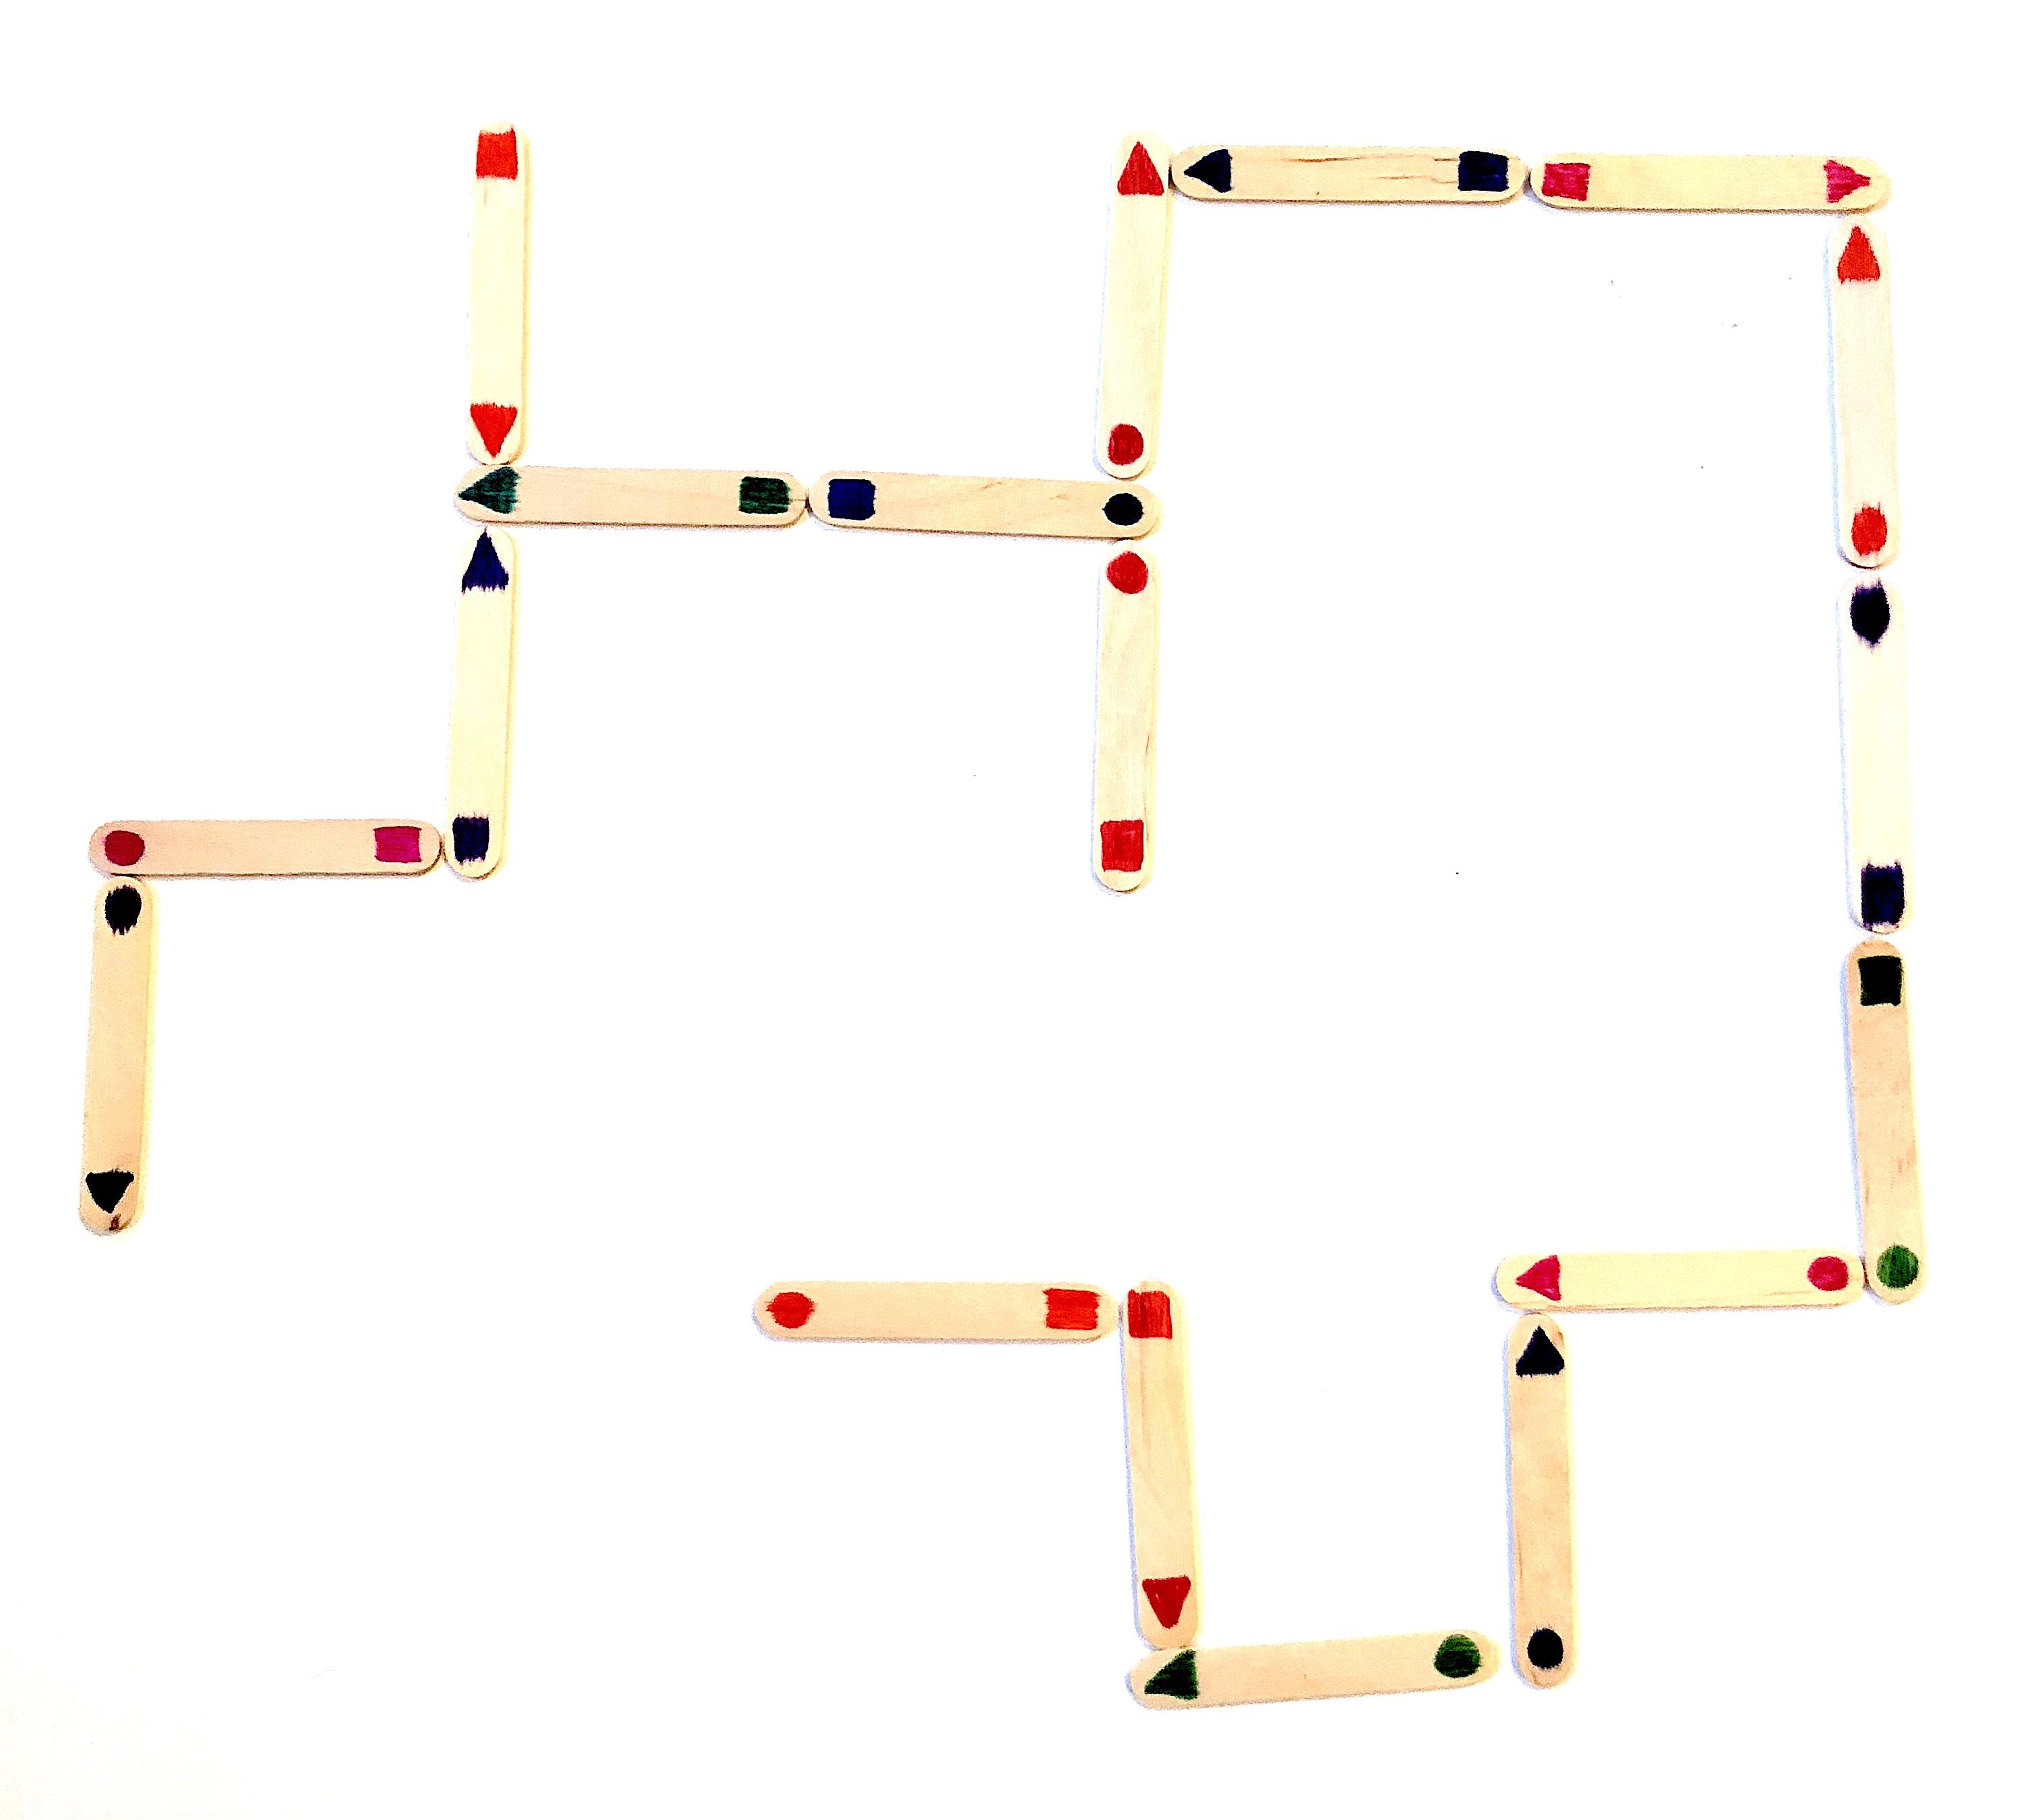 celebrate-picture-books-picture-book-review-shape-sticks-game